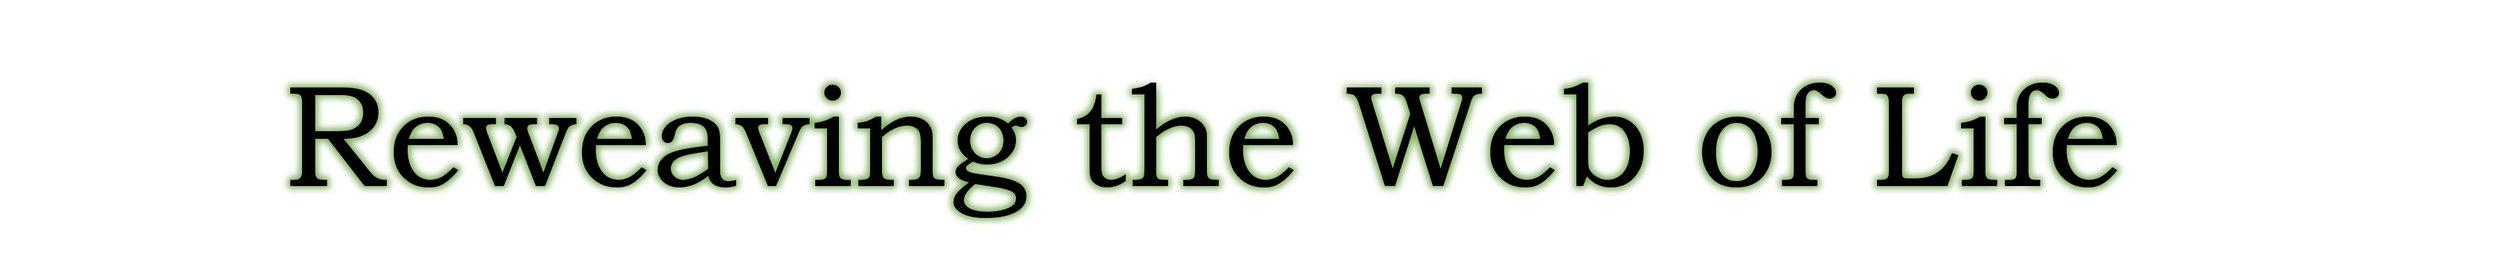 web-banner-green.jpg